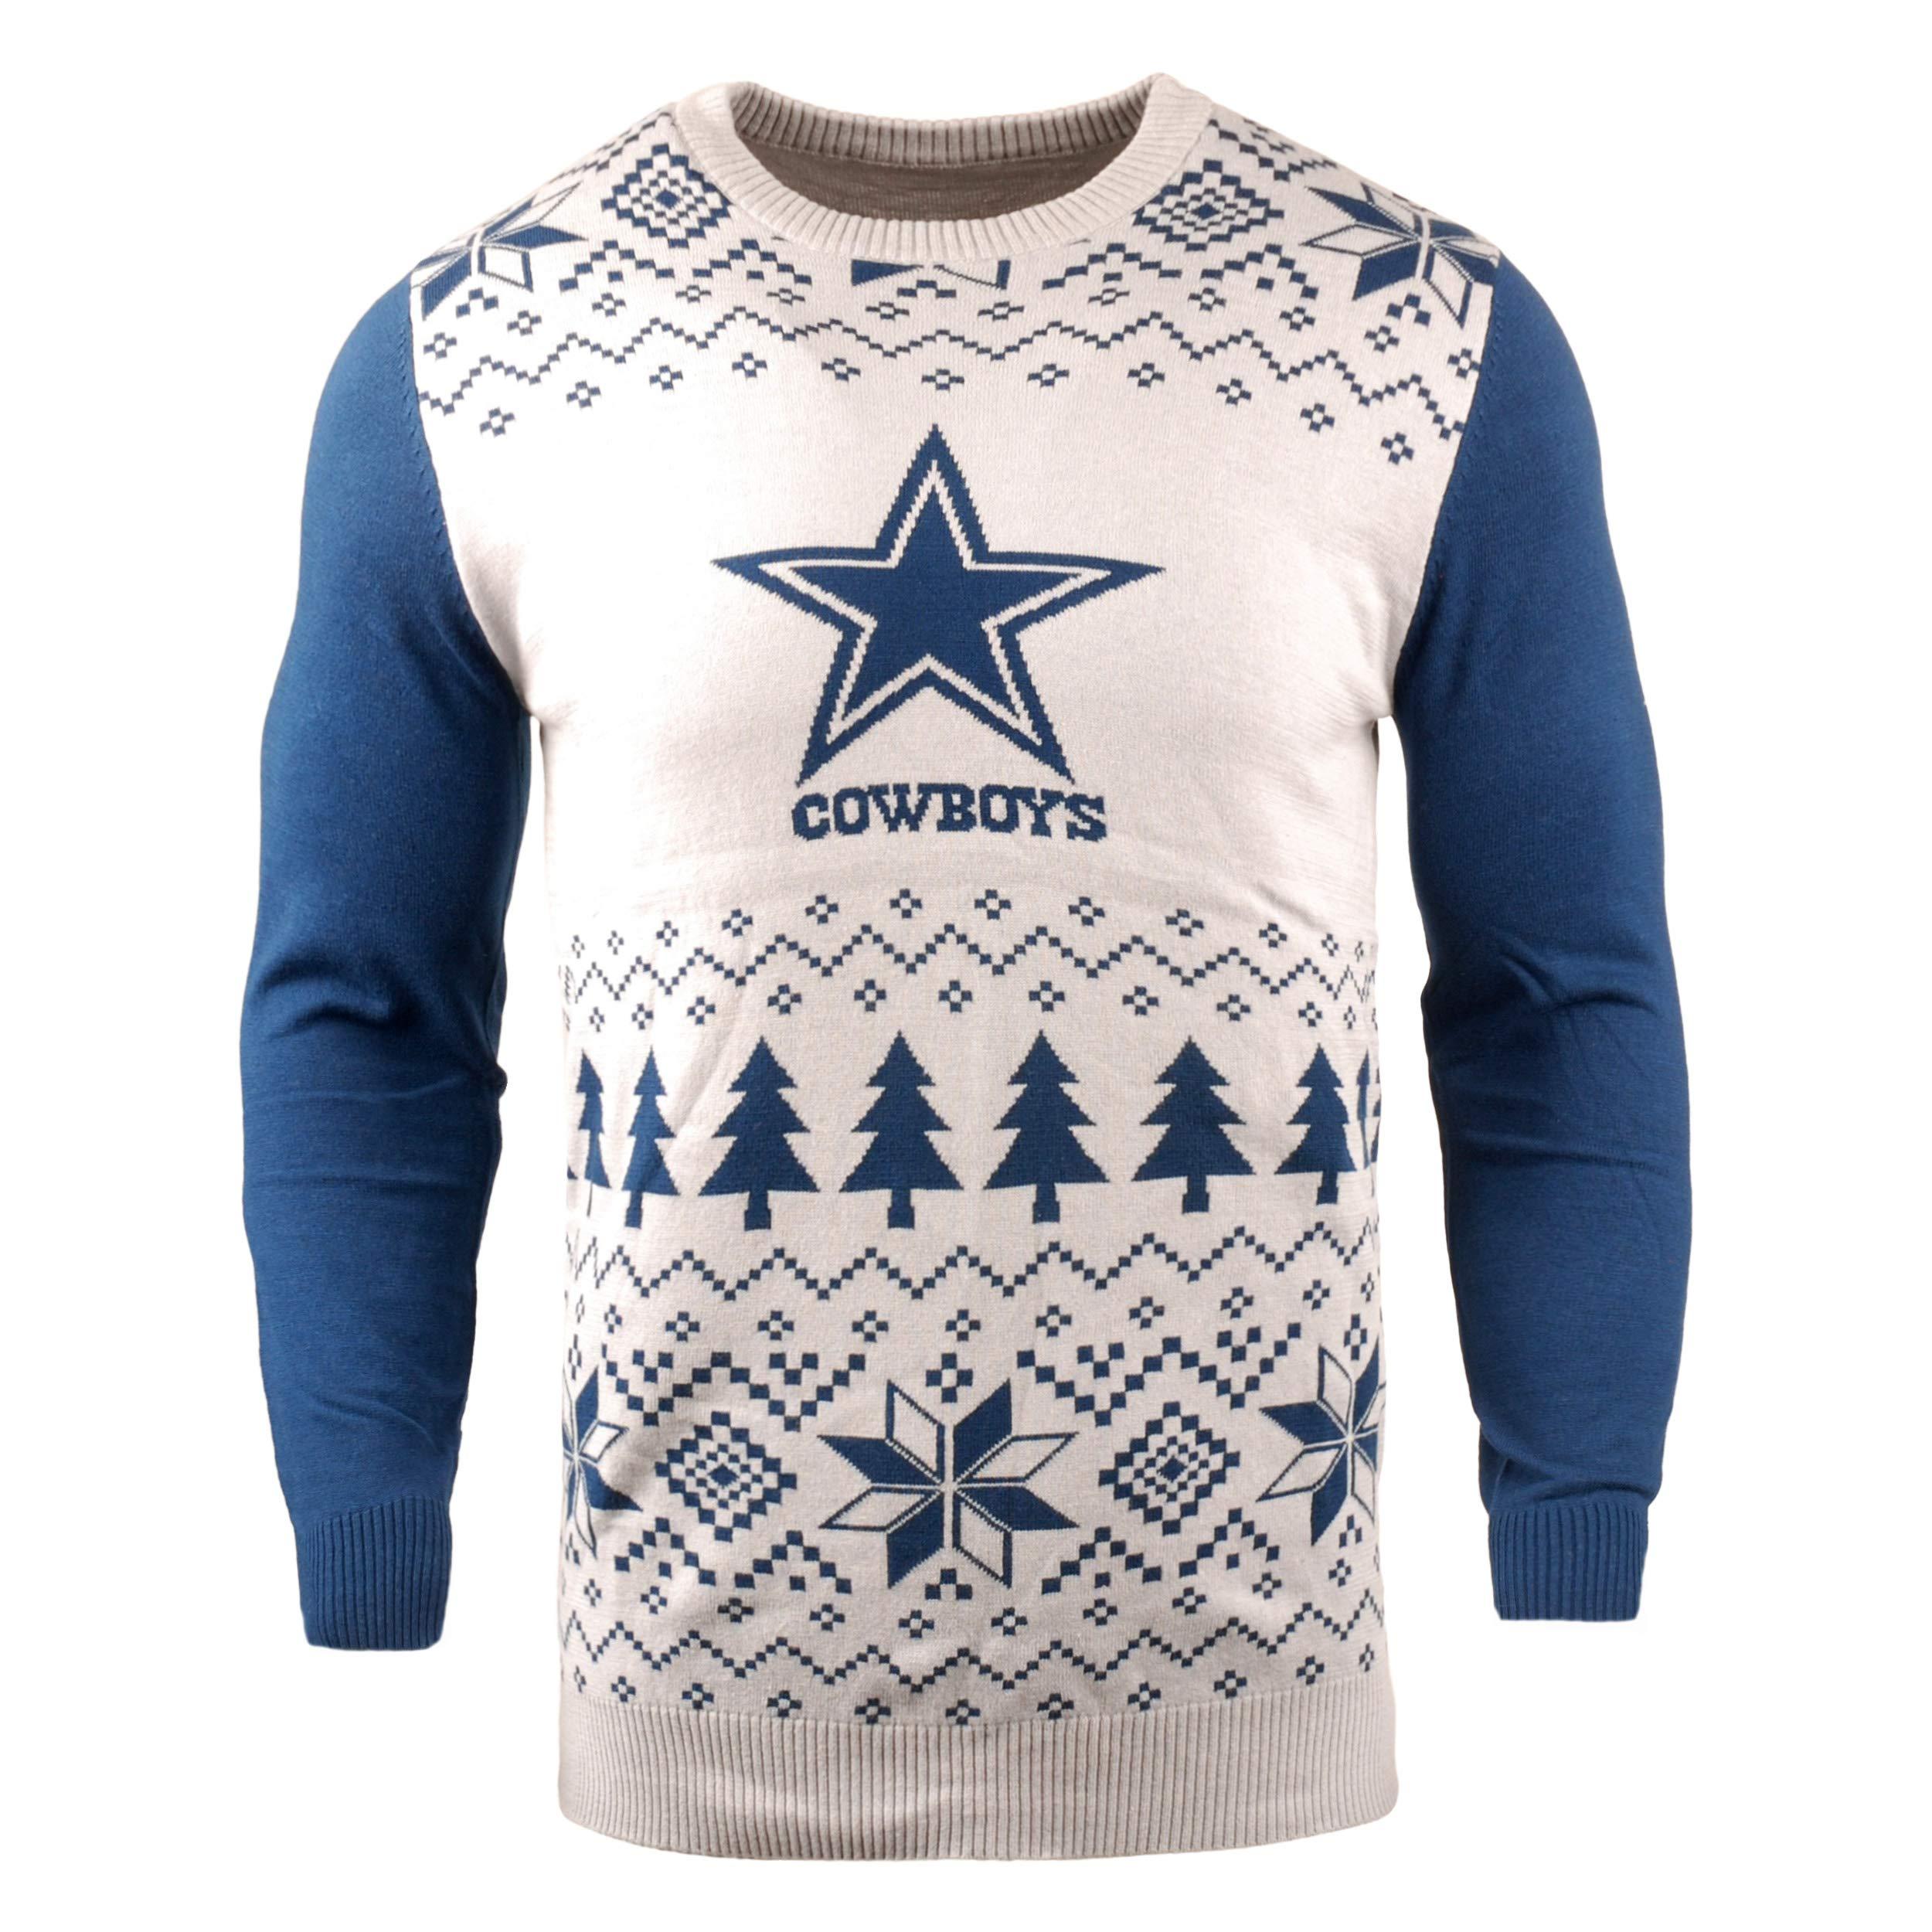 201ce124d317 Details about NFL Dallas Cowboys Ugly Sweater